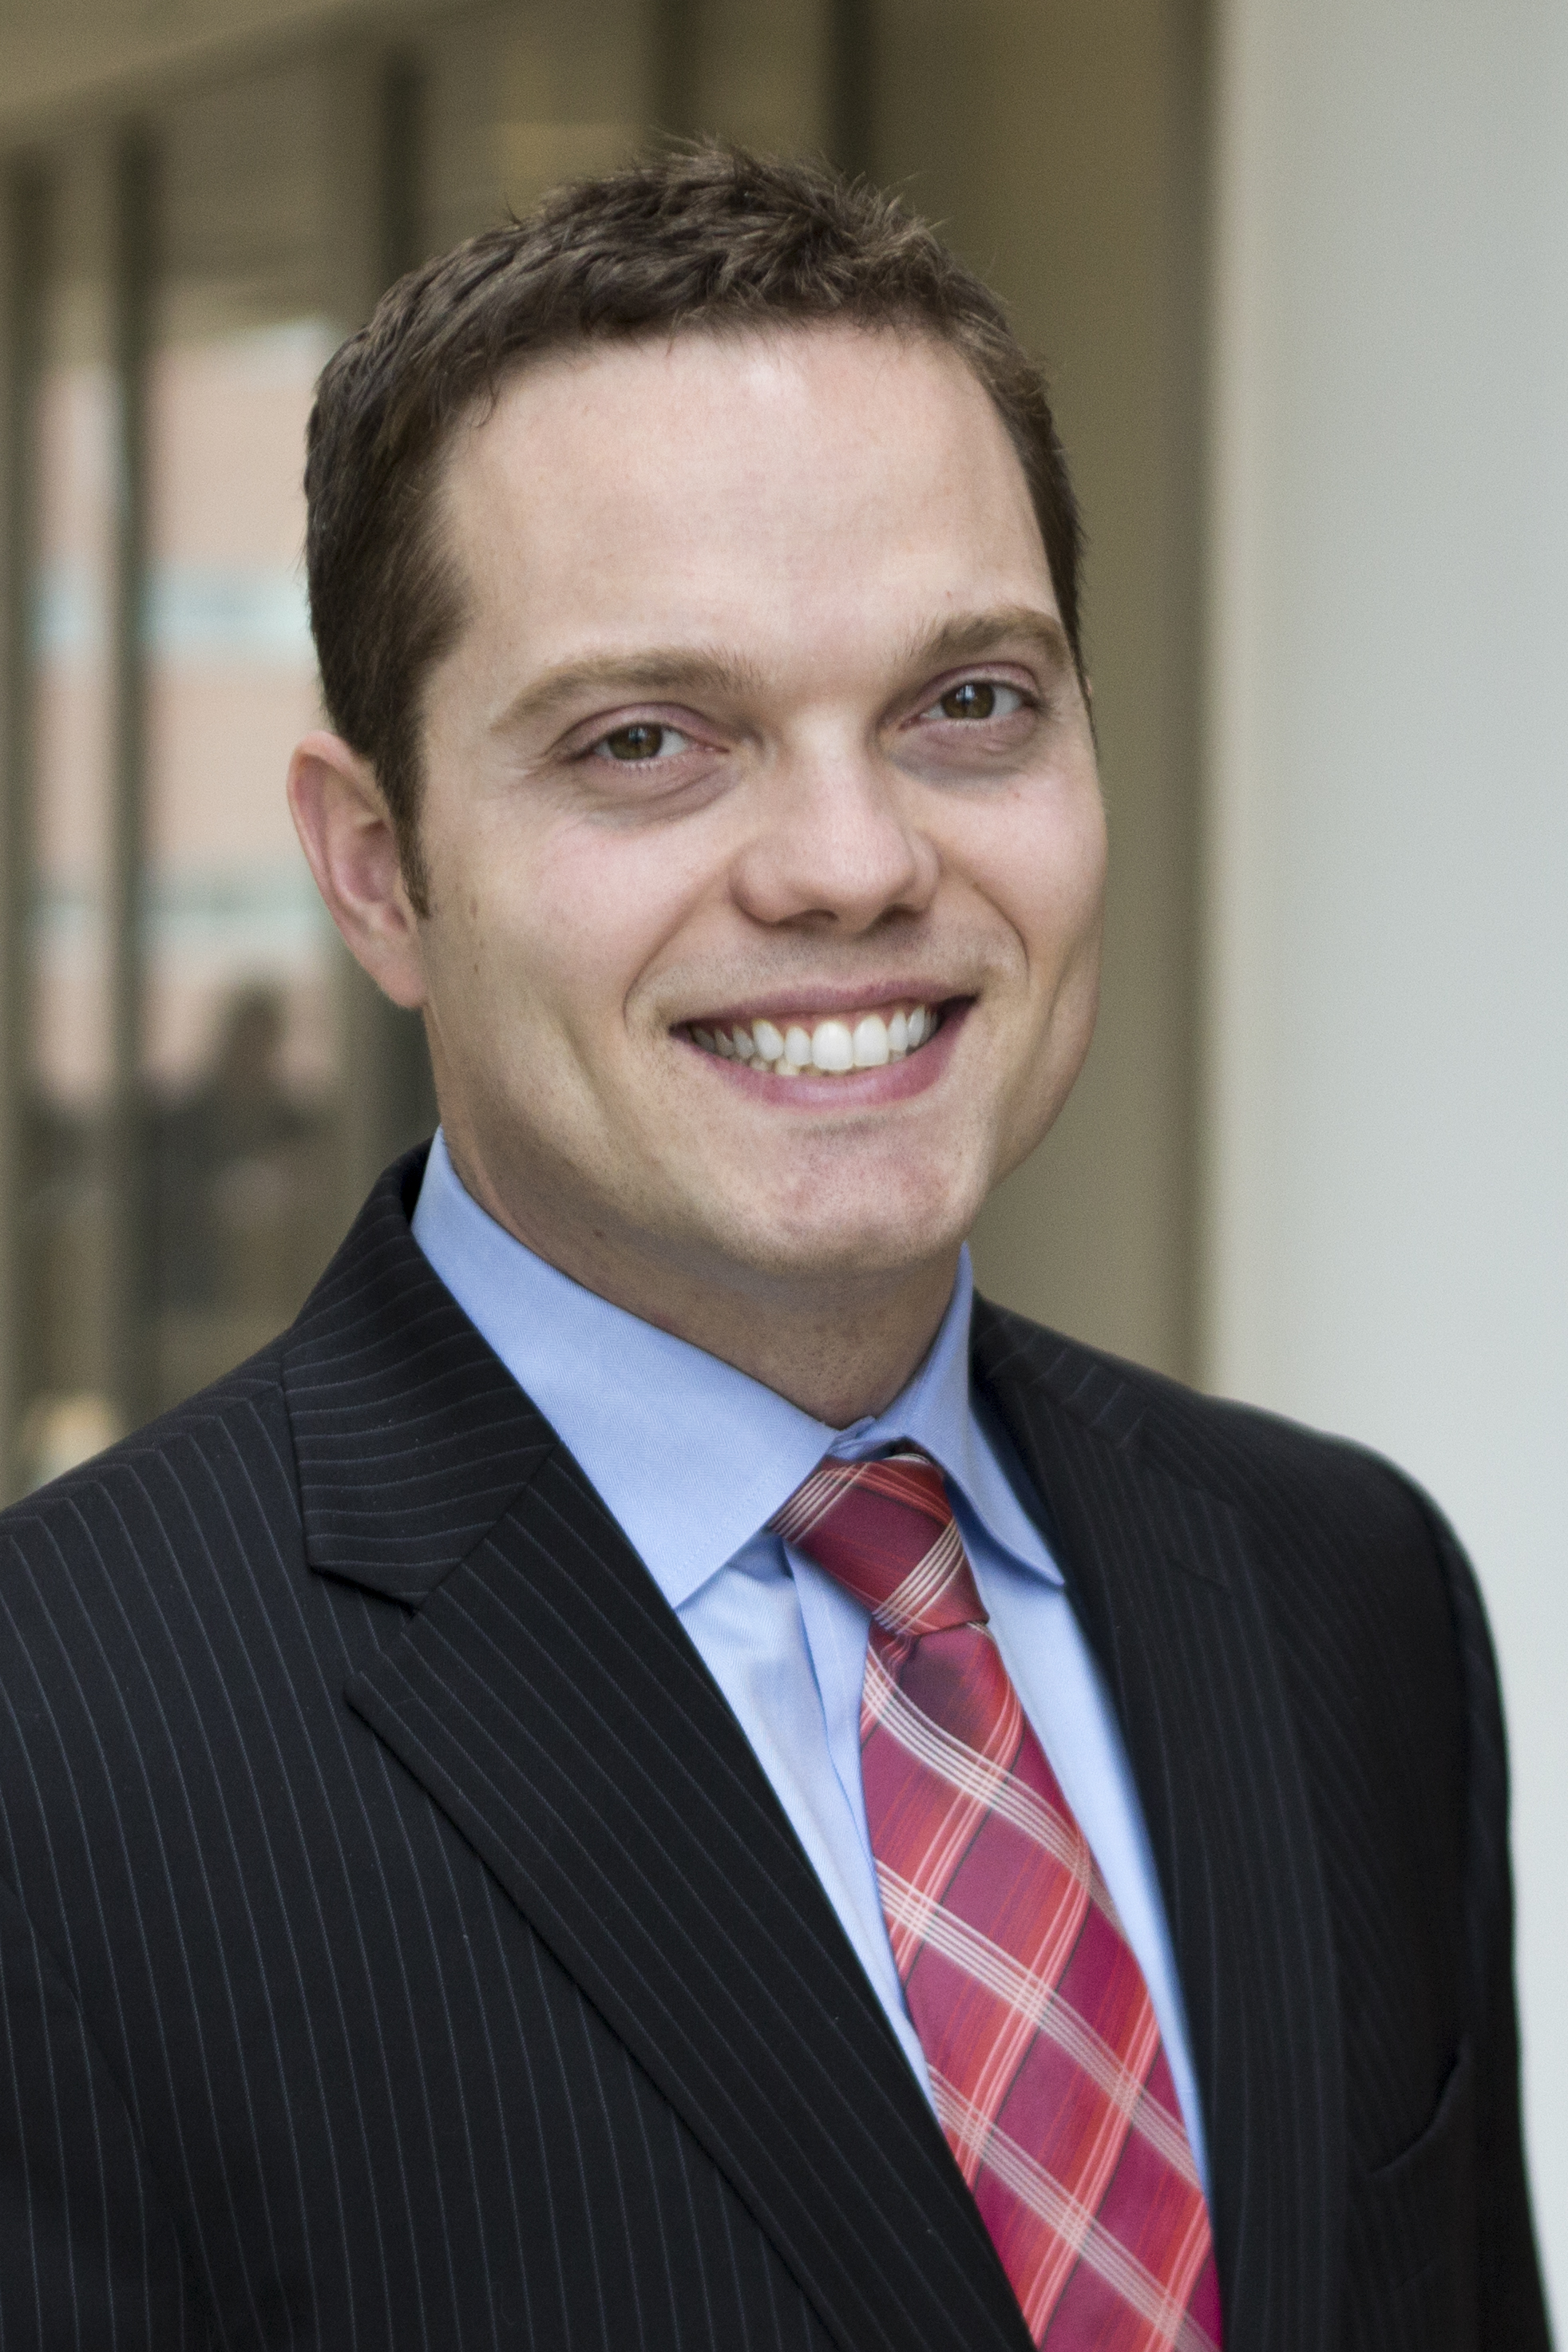 Profile image for T. Joseph Mattingly II